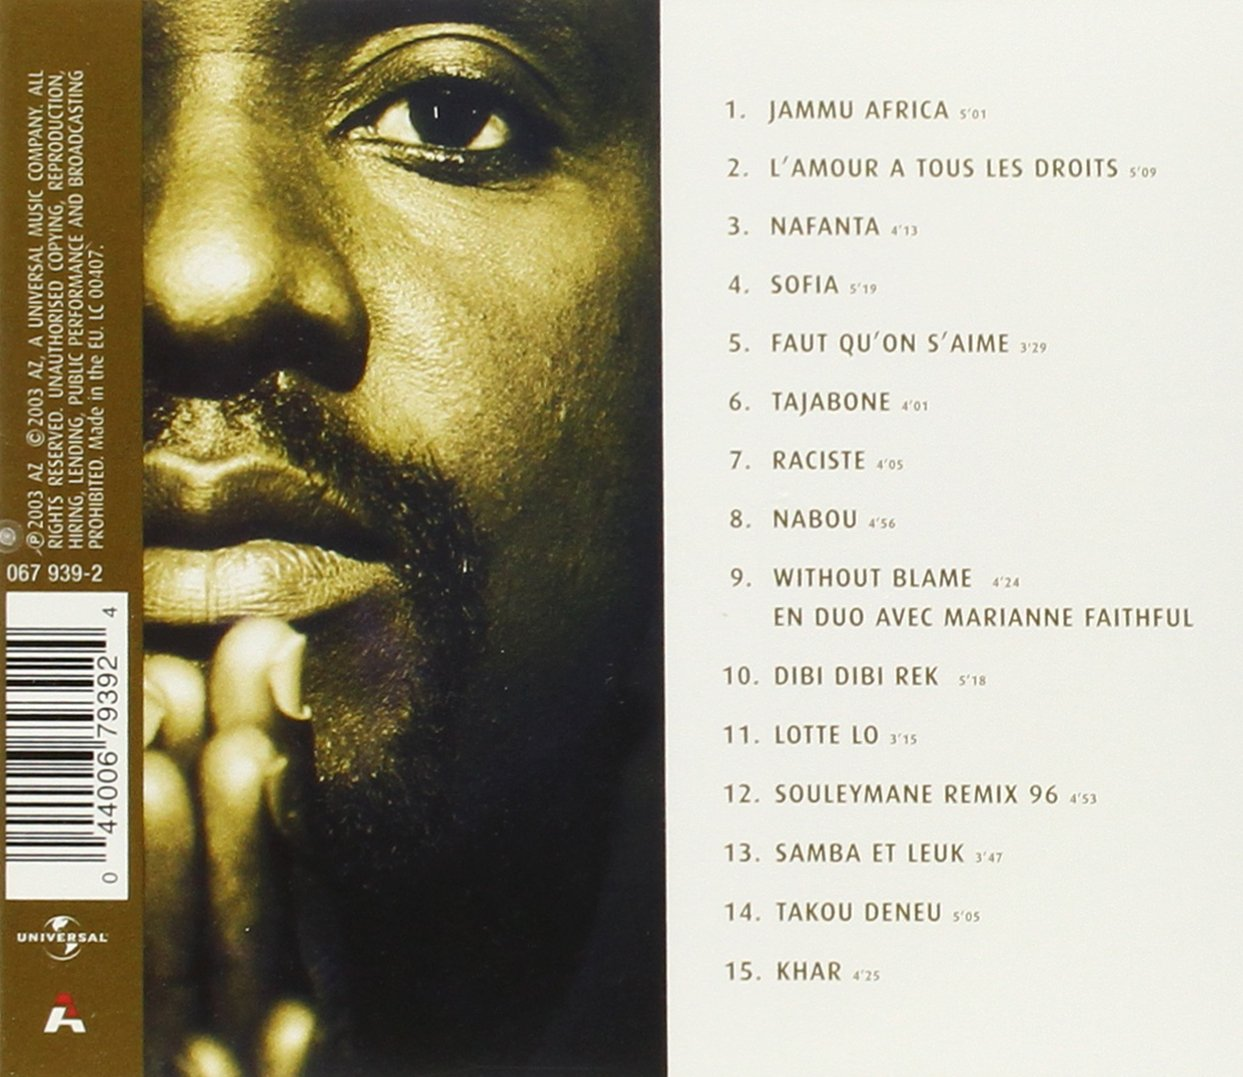 GRATUIT TÉLÉCHARGER ISMAEL AFRICA MP3 LO JAMMU